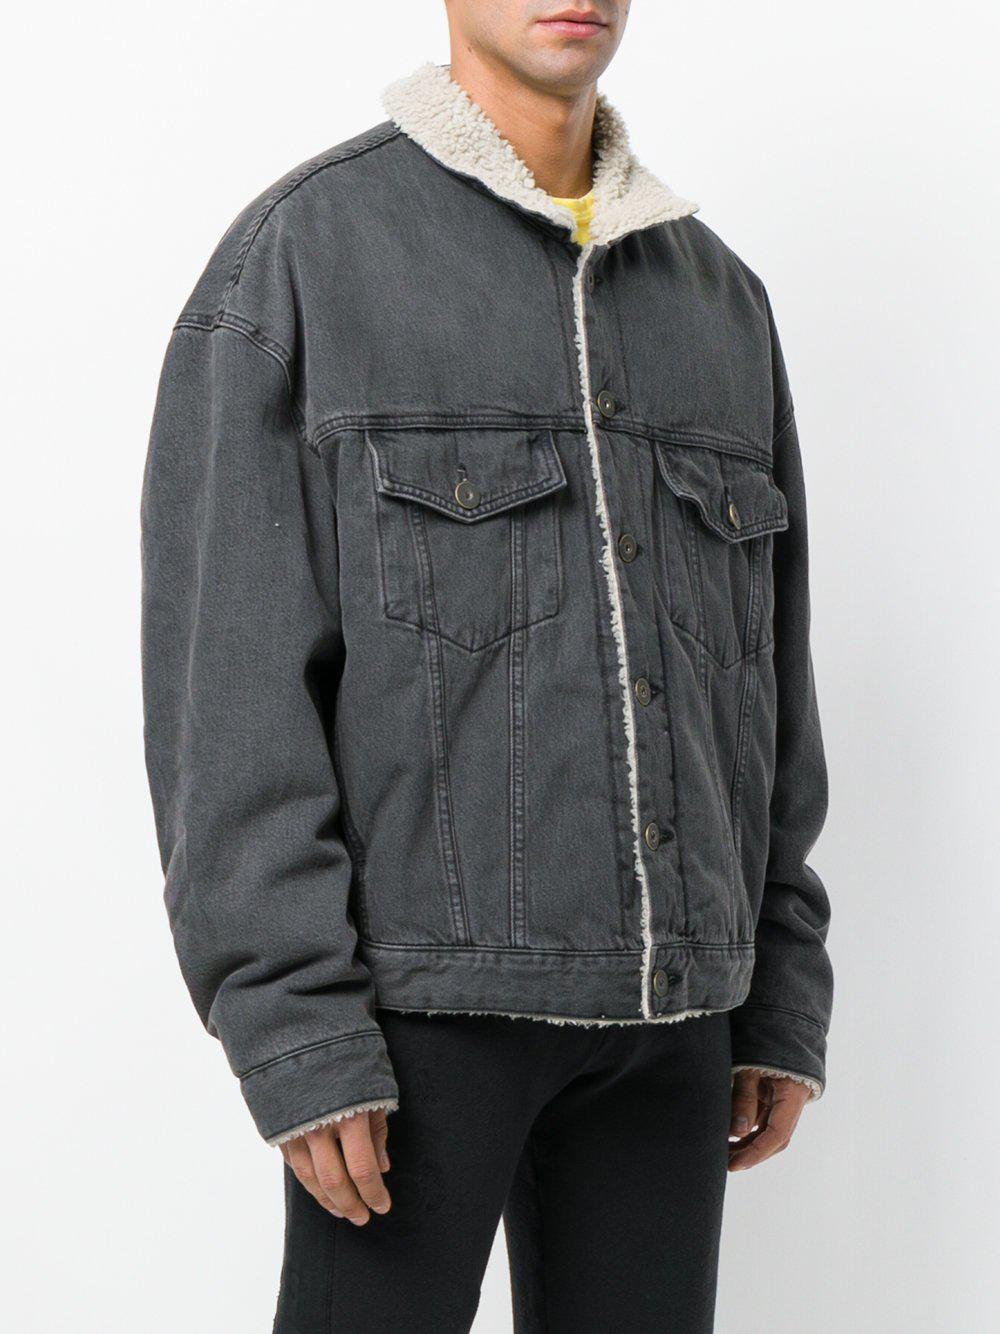 a247423bf Yeezy Classic Sherpa Jean Jacket in Black for Men - Lyst